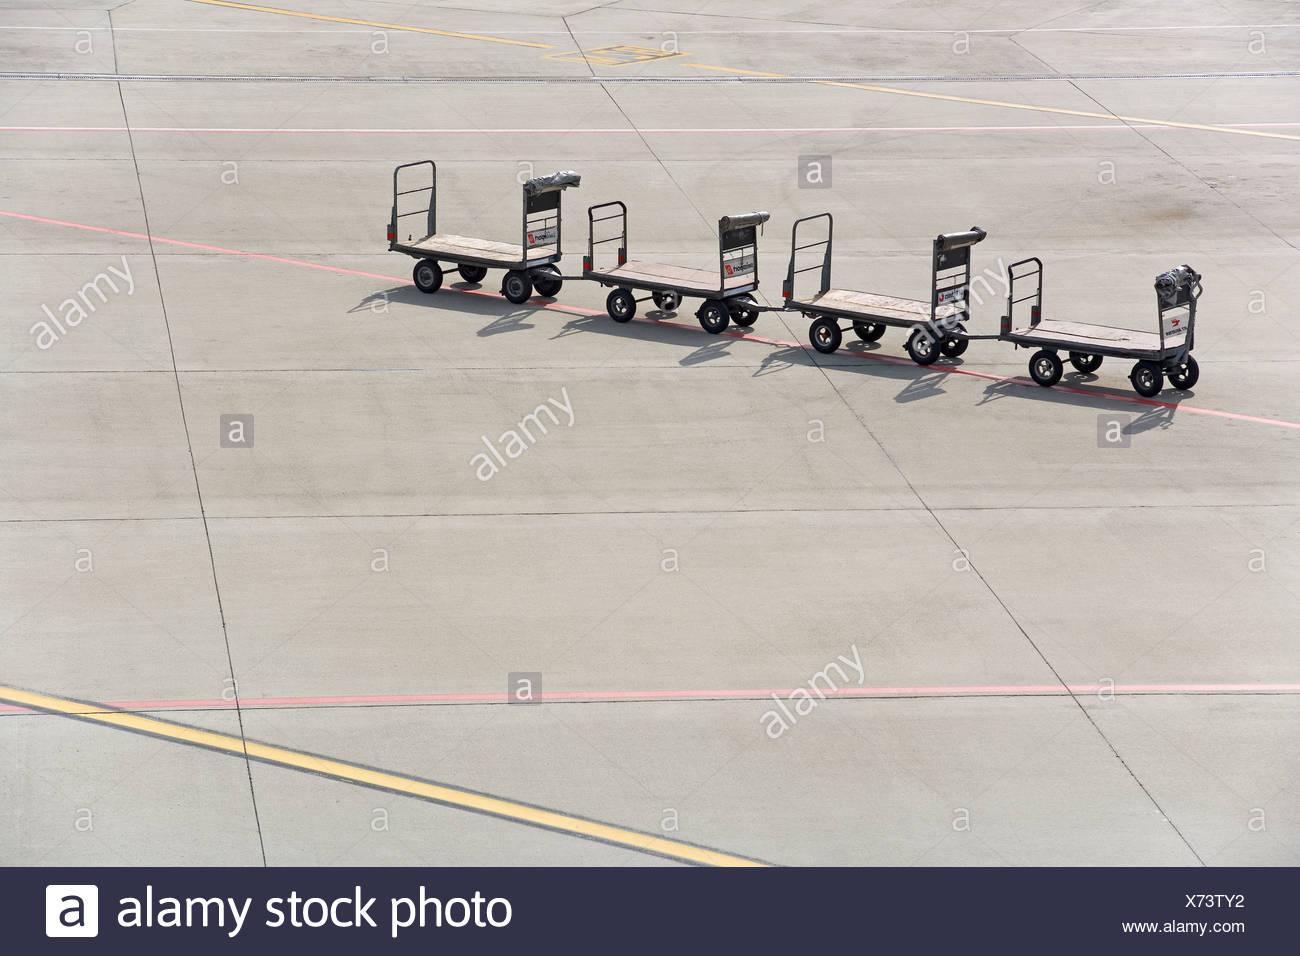 Luggage cart, Zuerich Airport, Switzerland, Europe - Stock Image